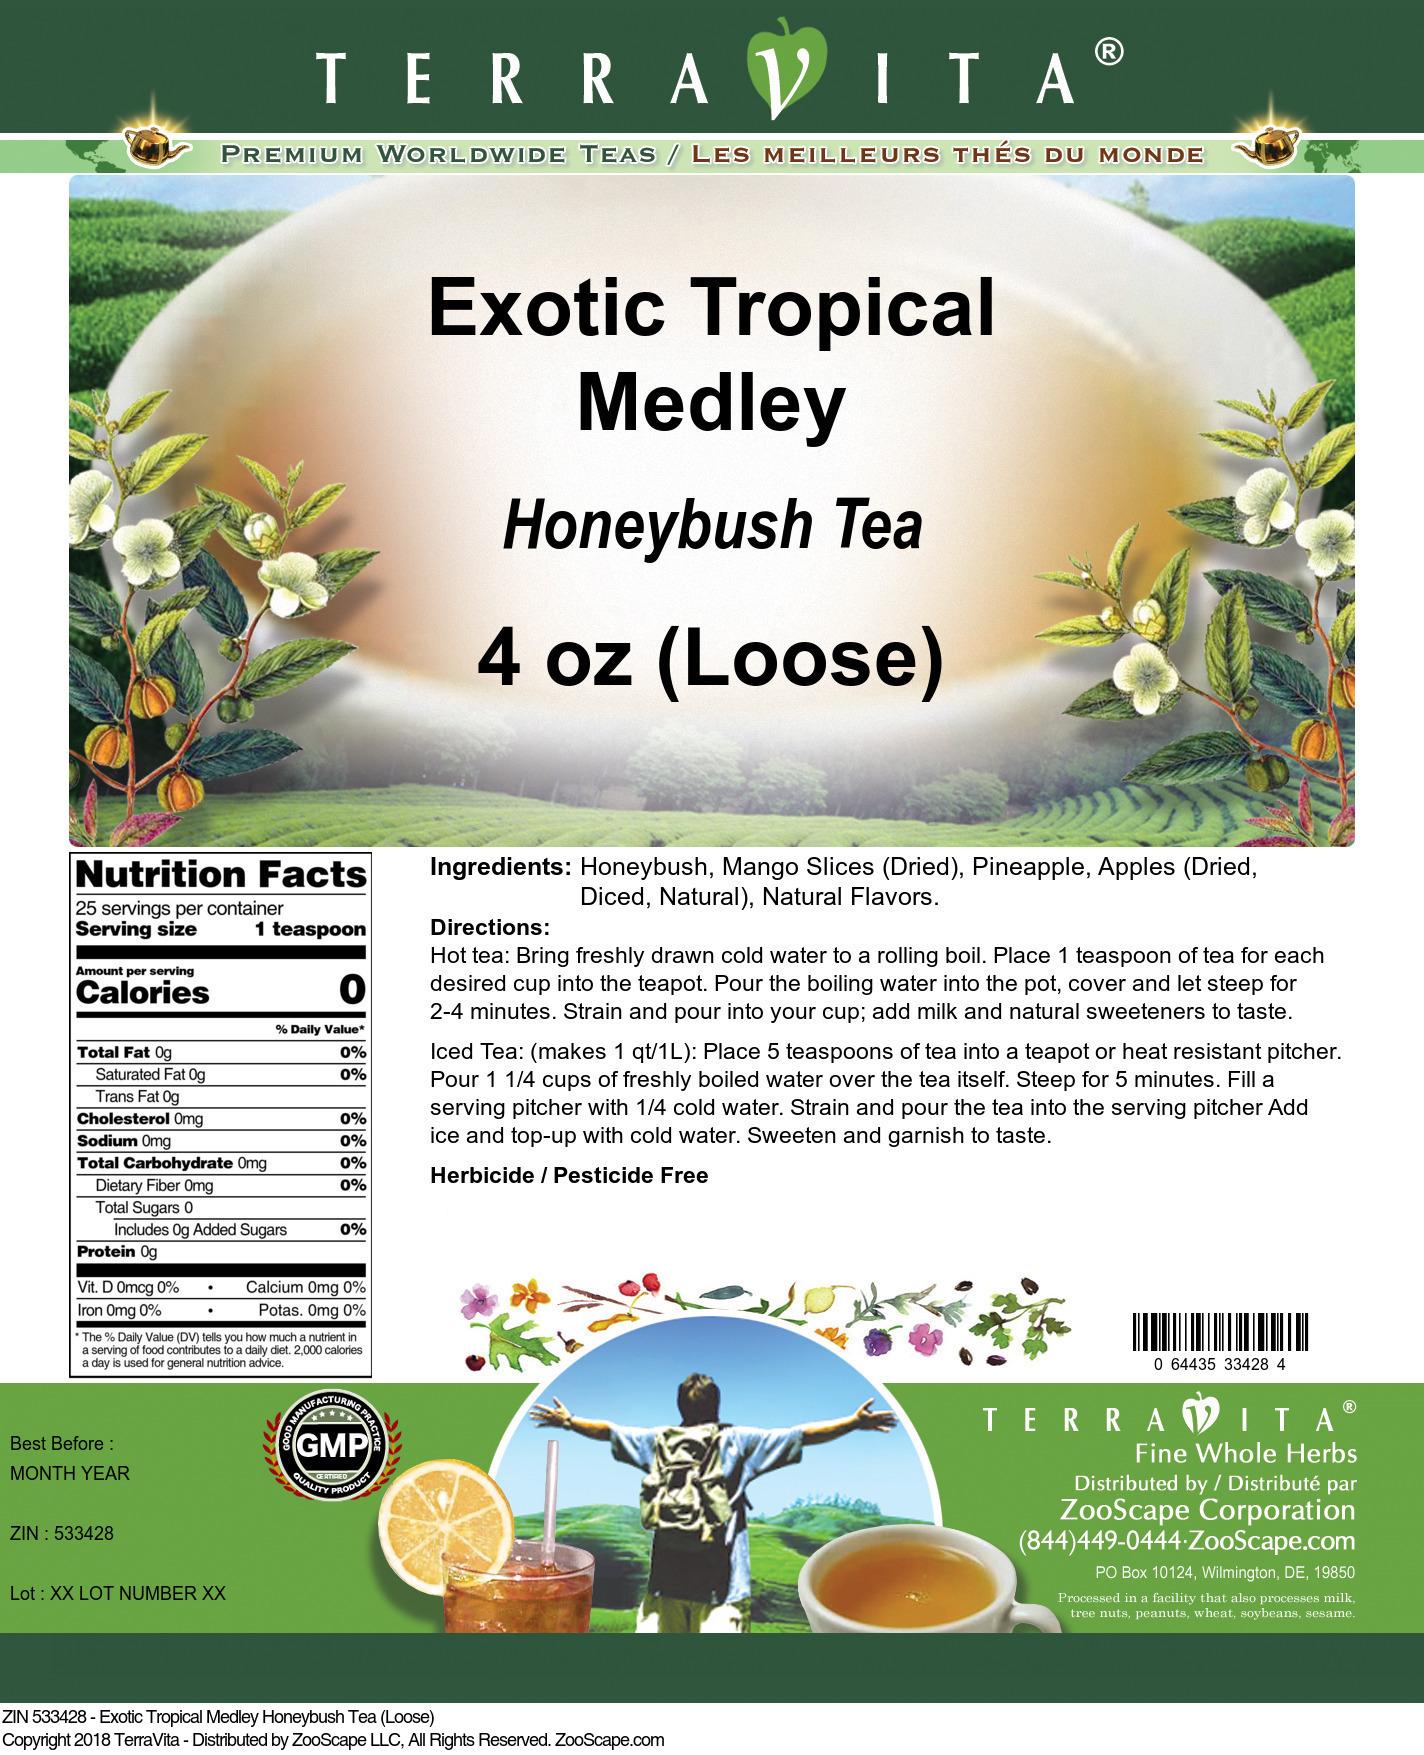 Exotic Tropical Medley Honeybush Tea (Loose)